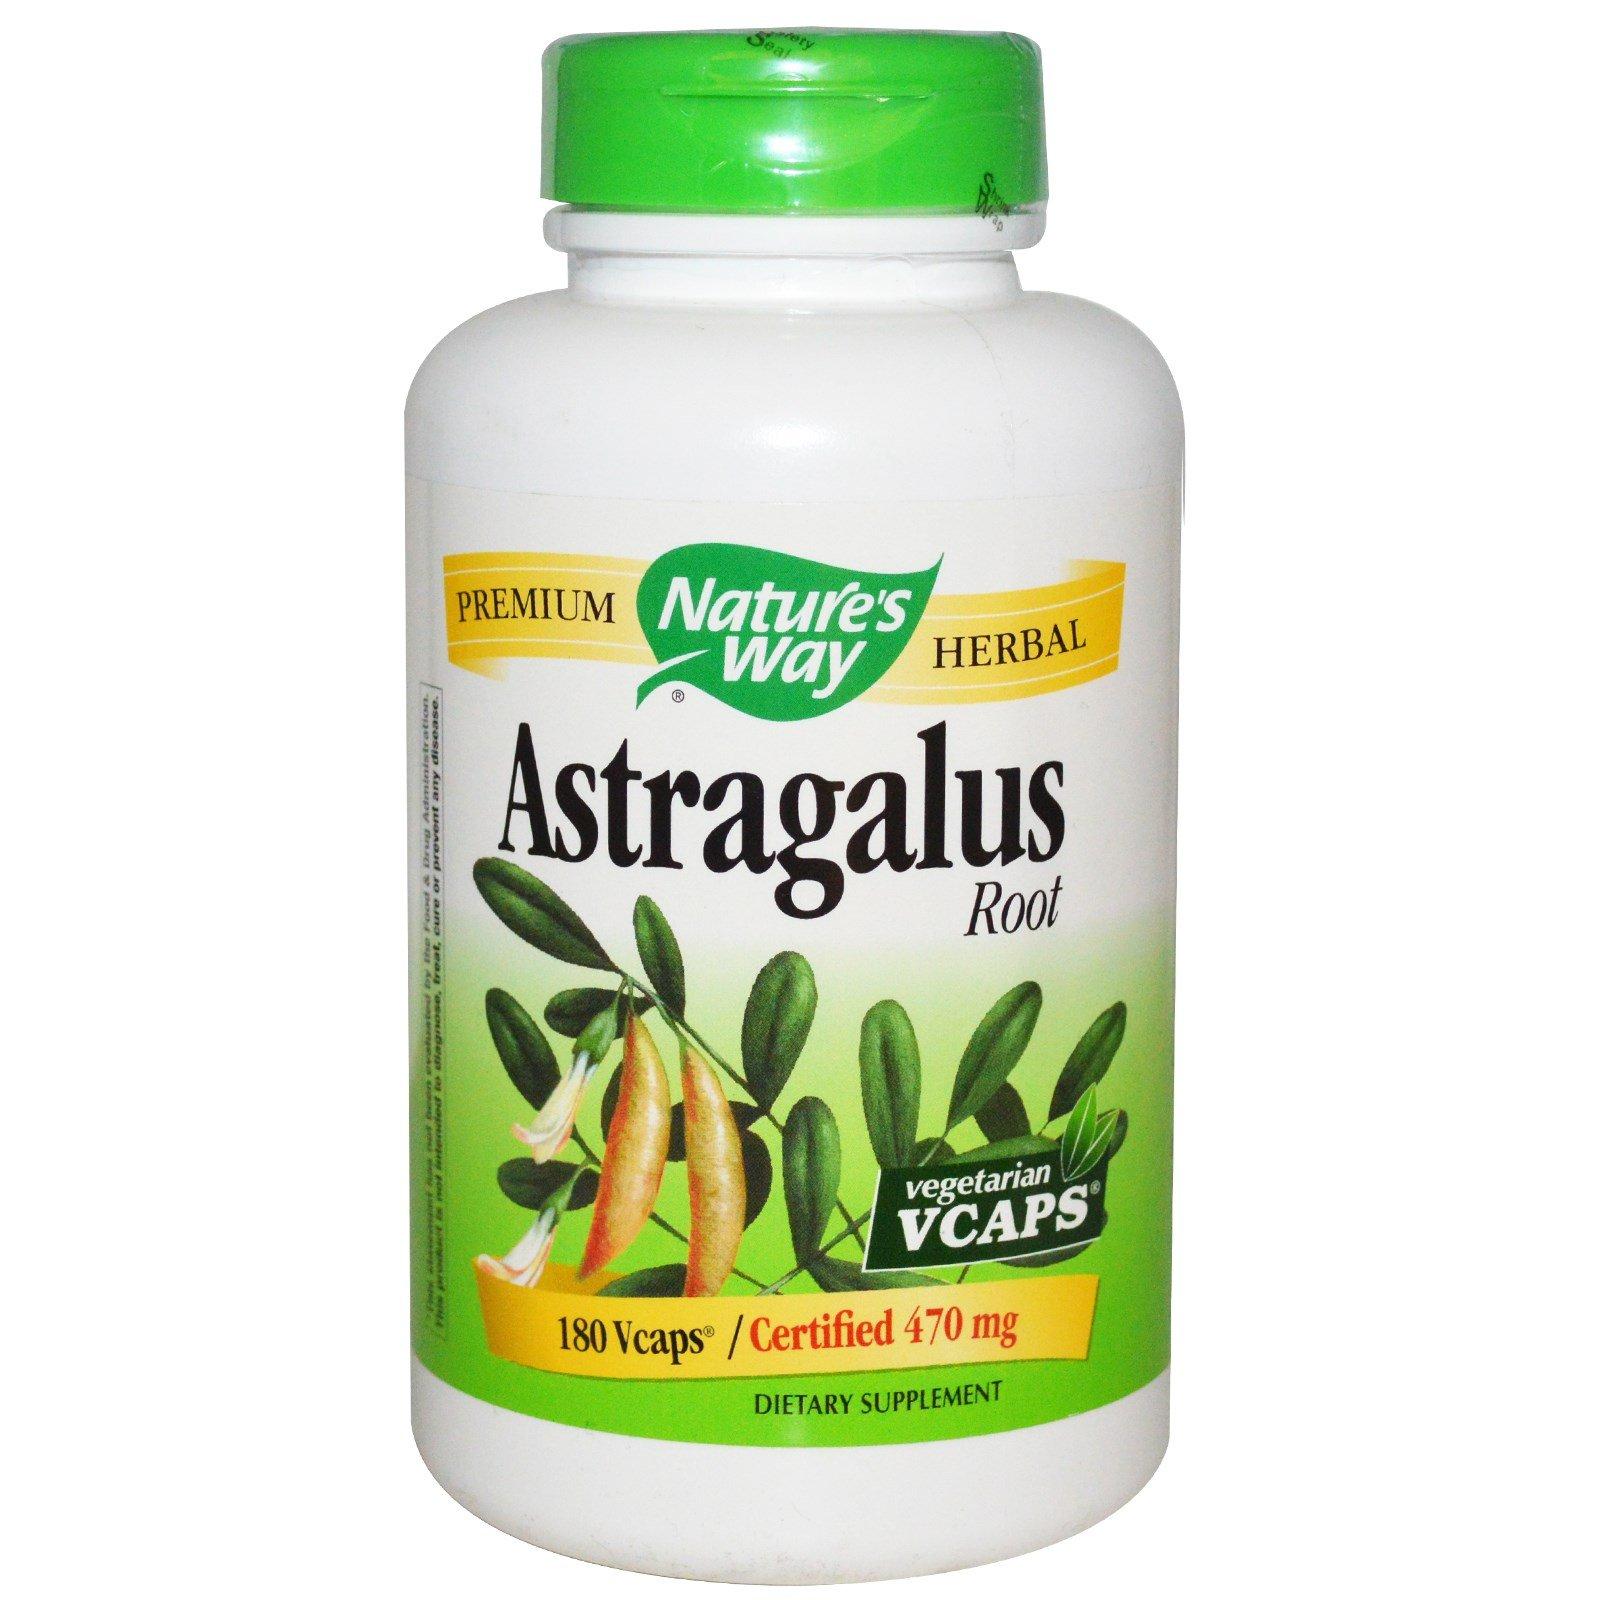 Nature's Way Astragalus Root, 470 milligrams, 180 Vegetarian Capsules. Pack of 2 bottles